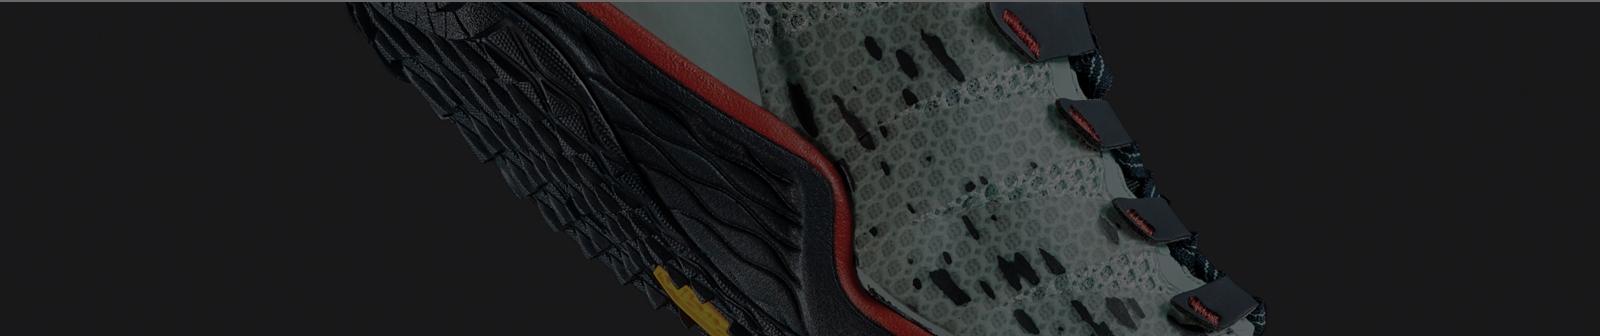 Trail Glove 5